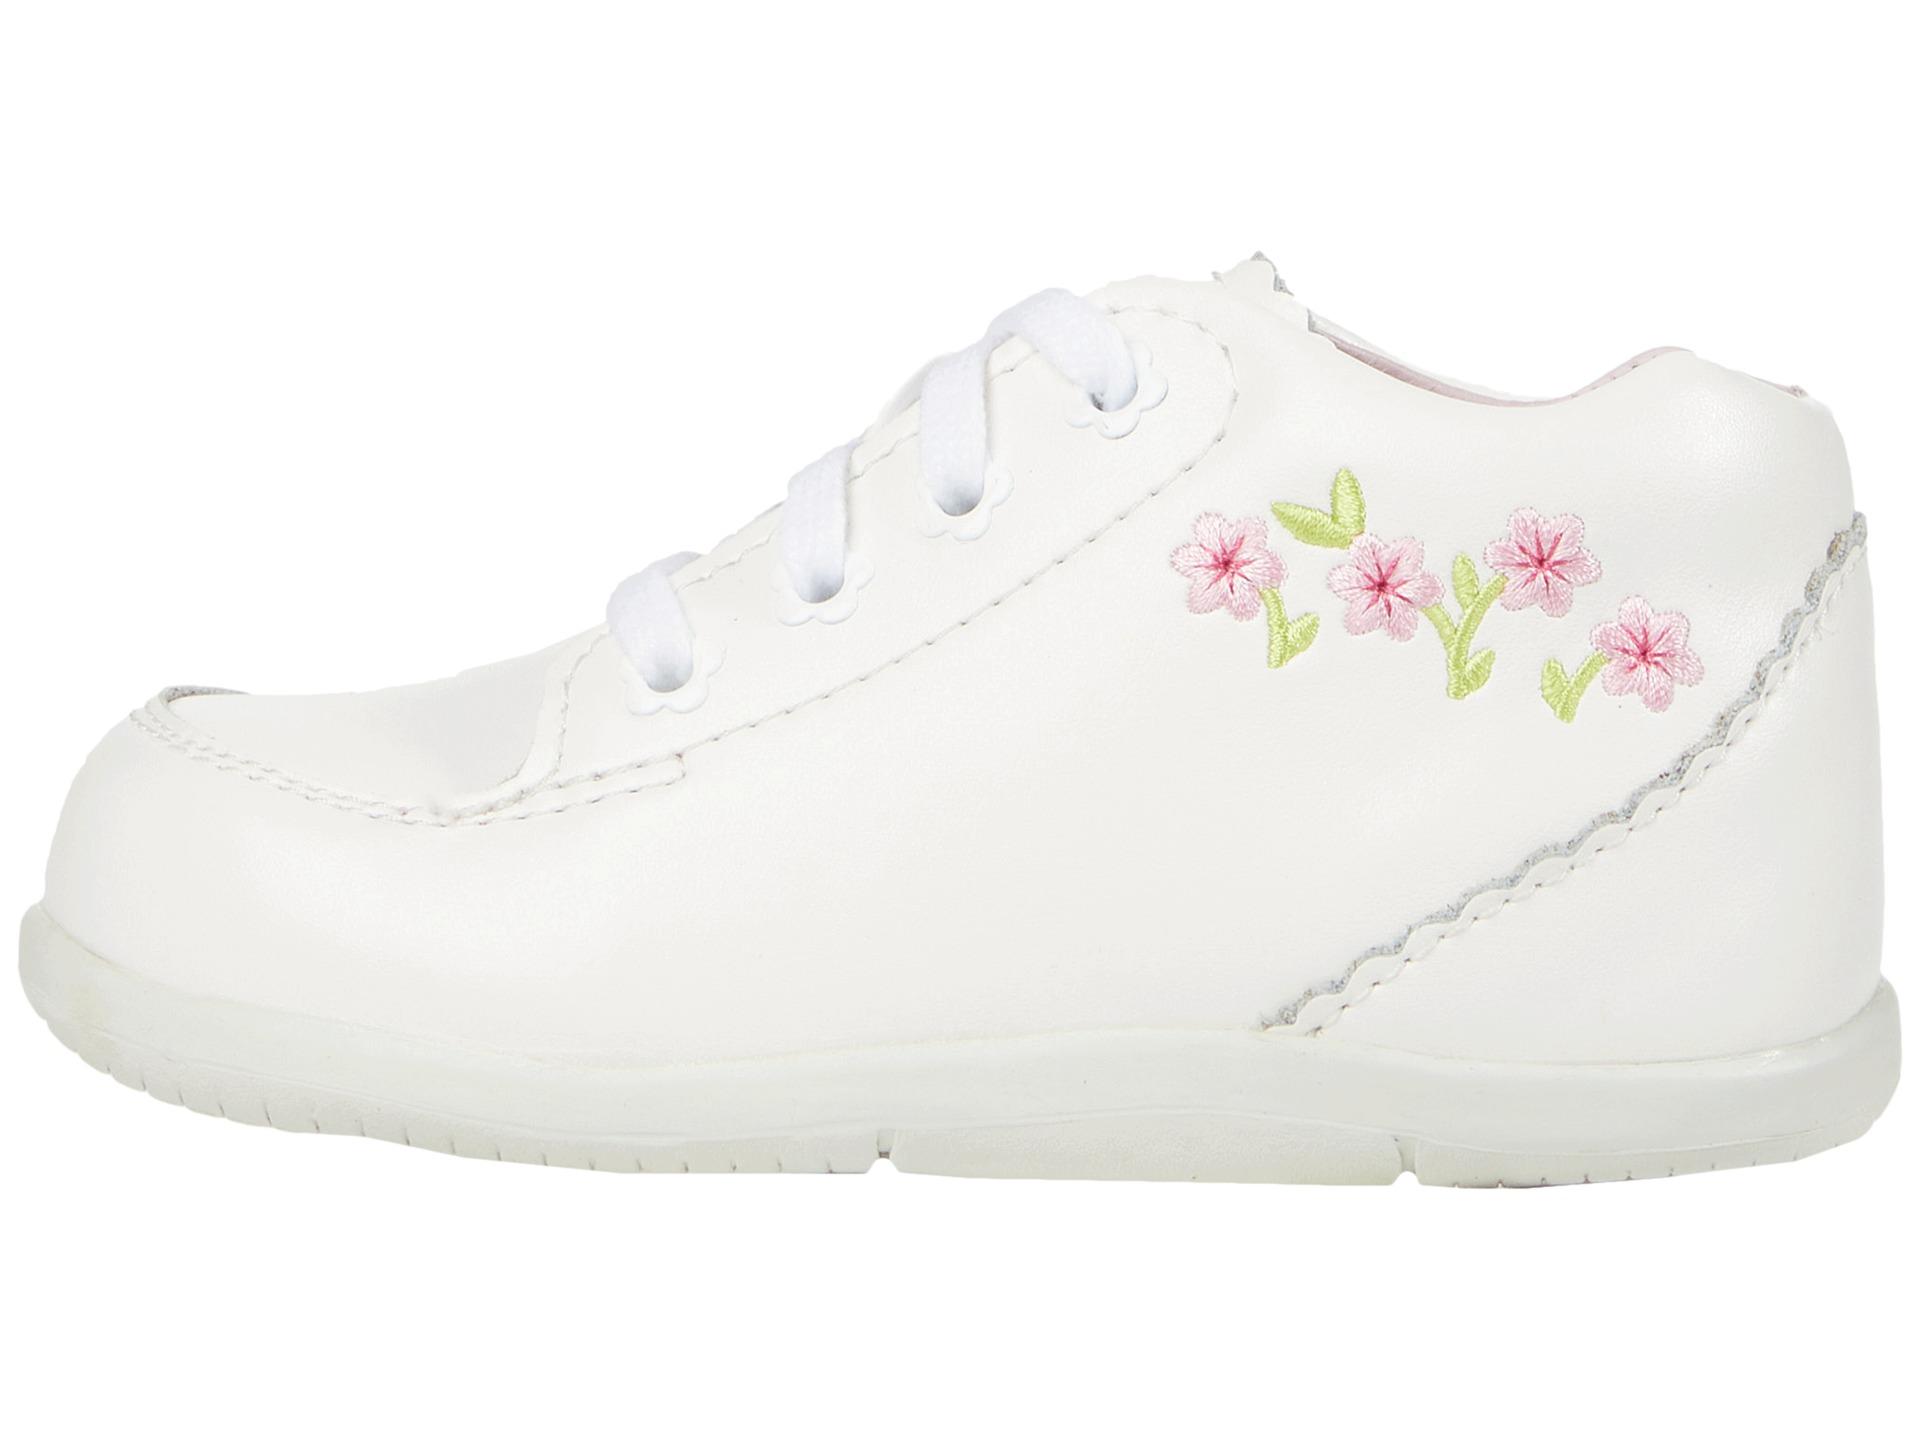 Stride Rite Baby Girl Walking Shoes